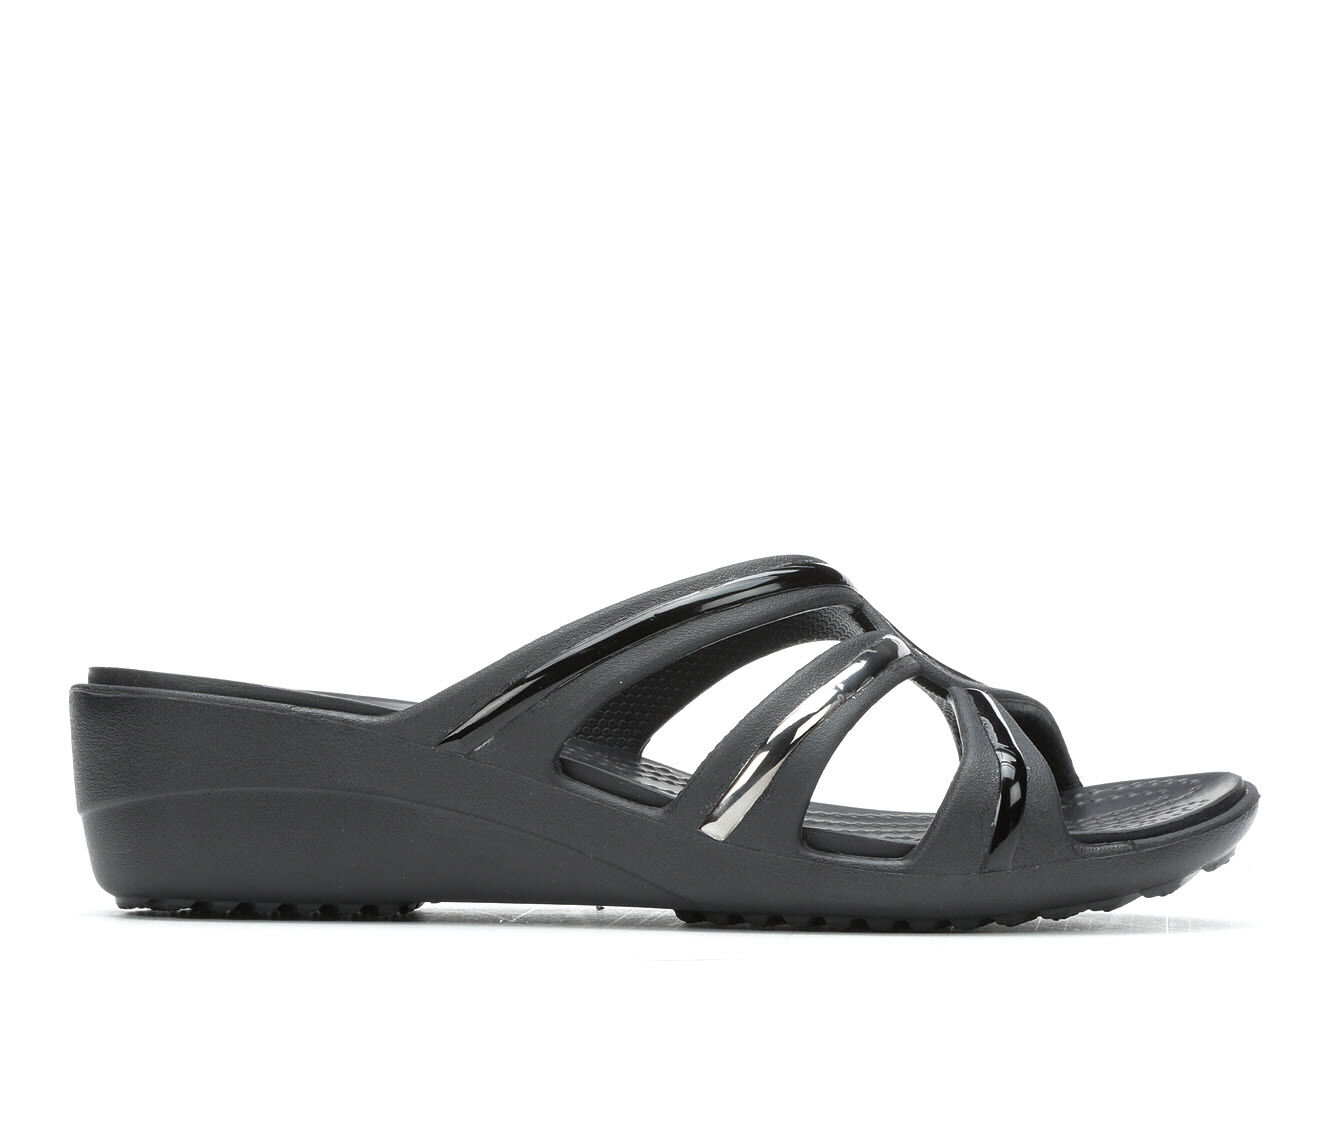 get further Women's Crocs Sanrah Metalblock Multi Black/Bla